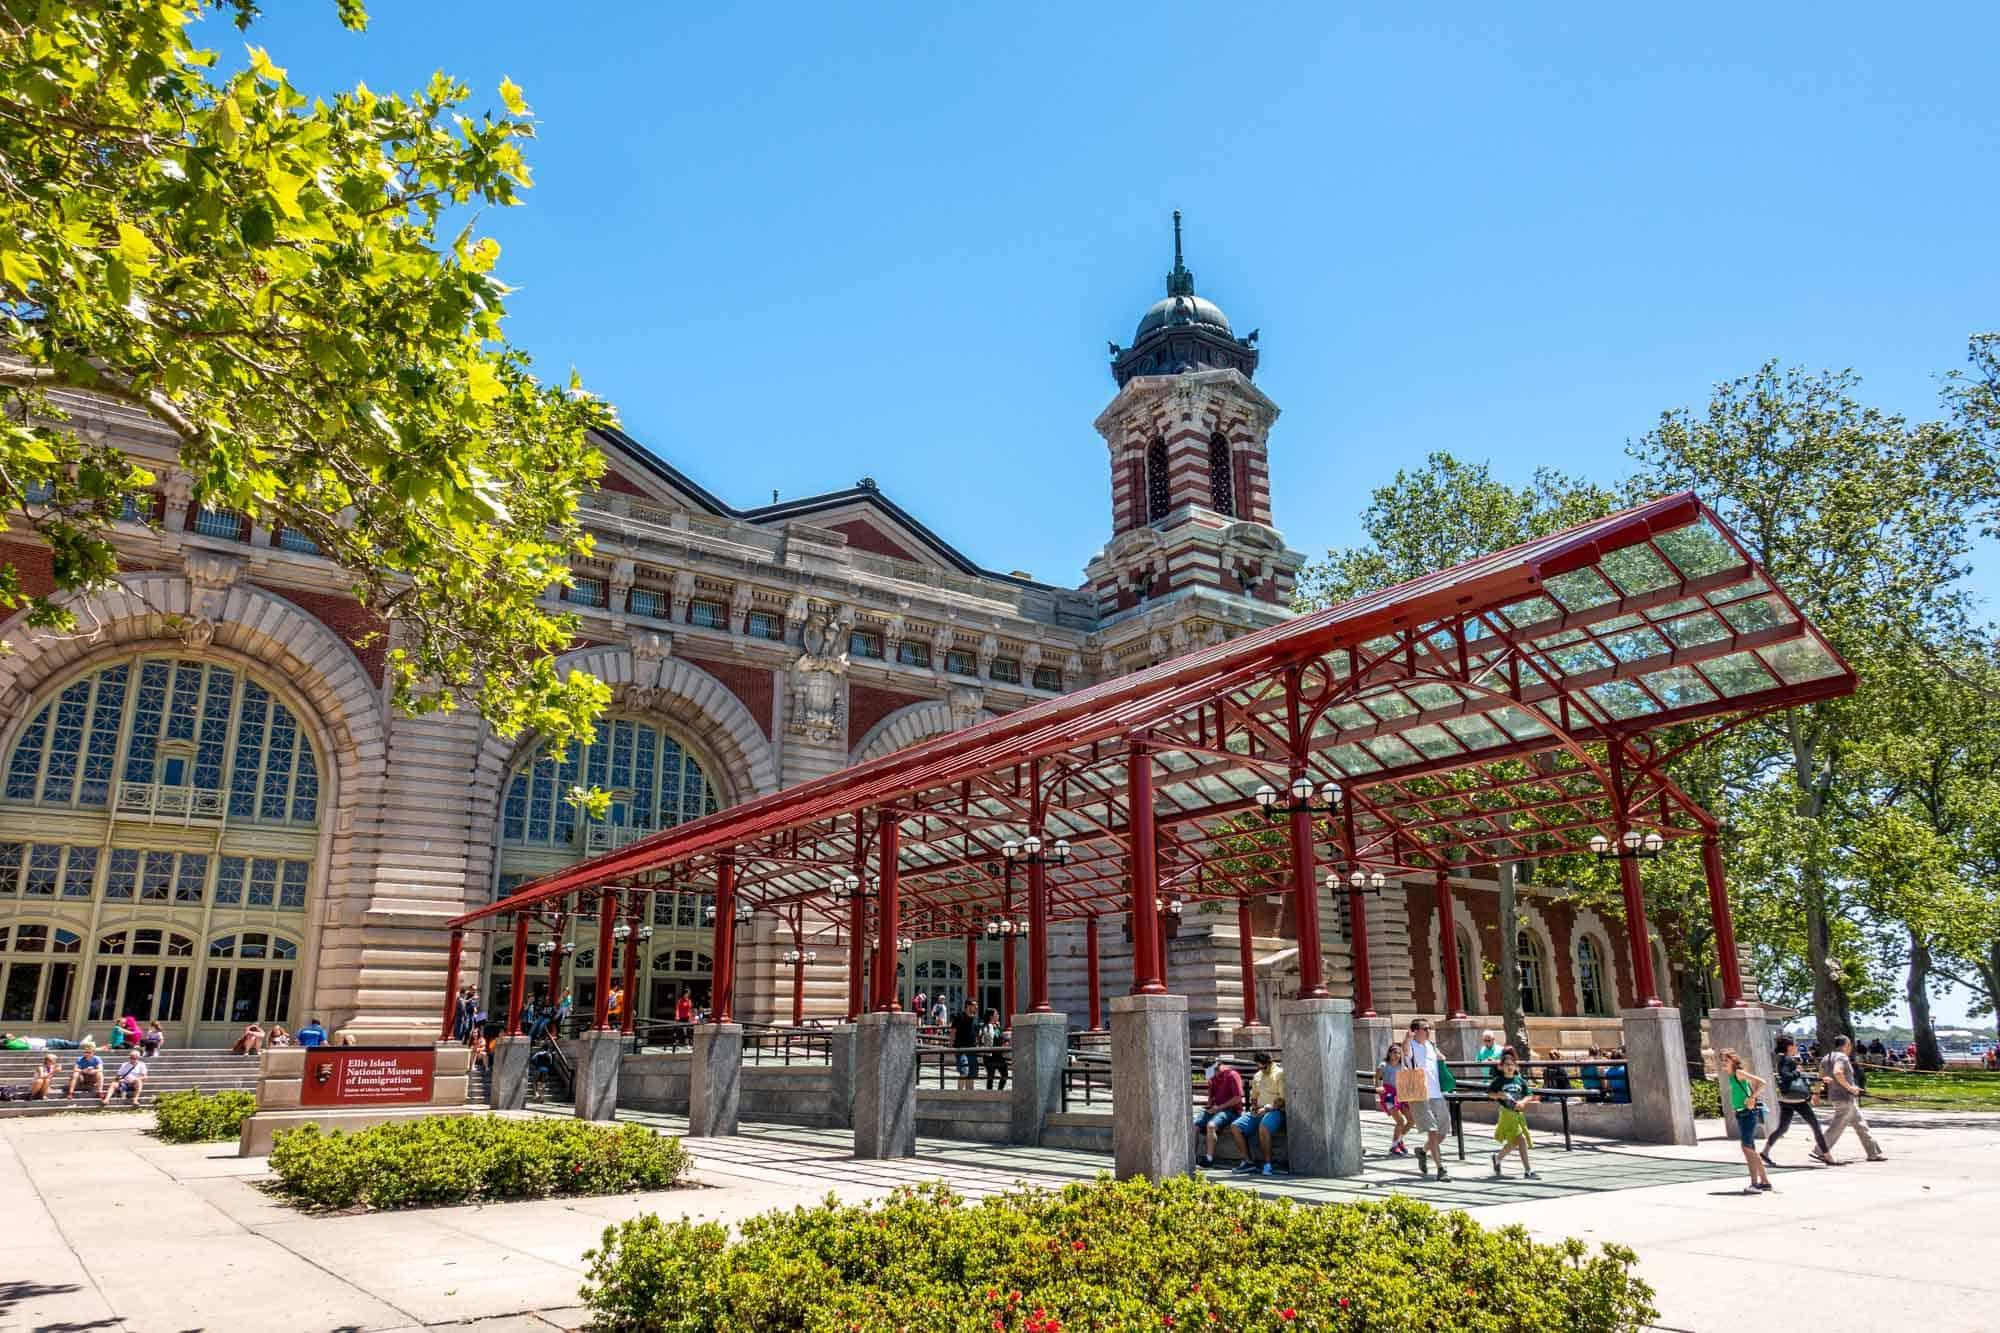 Entry to Ellis Island Museum